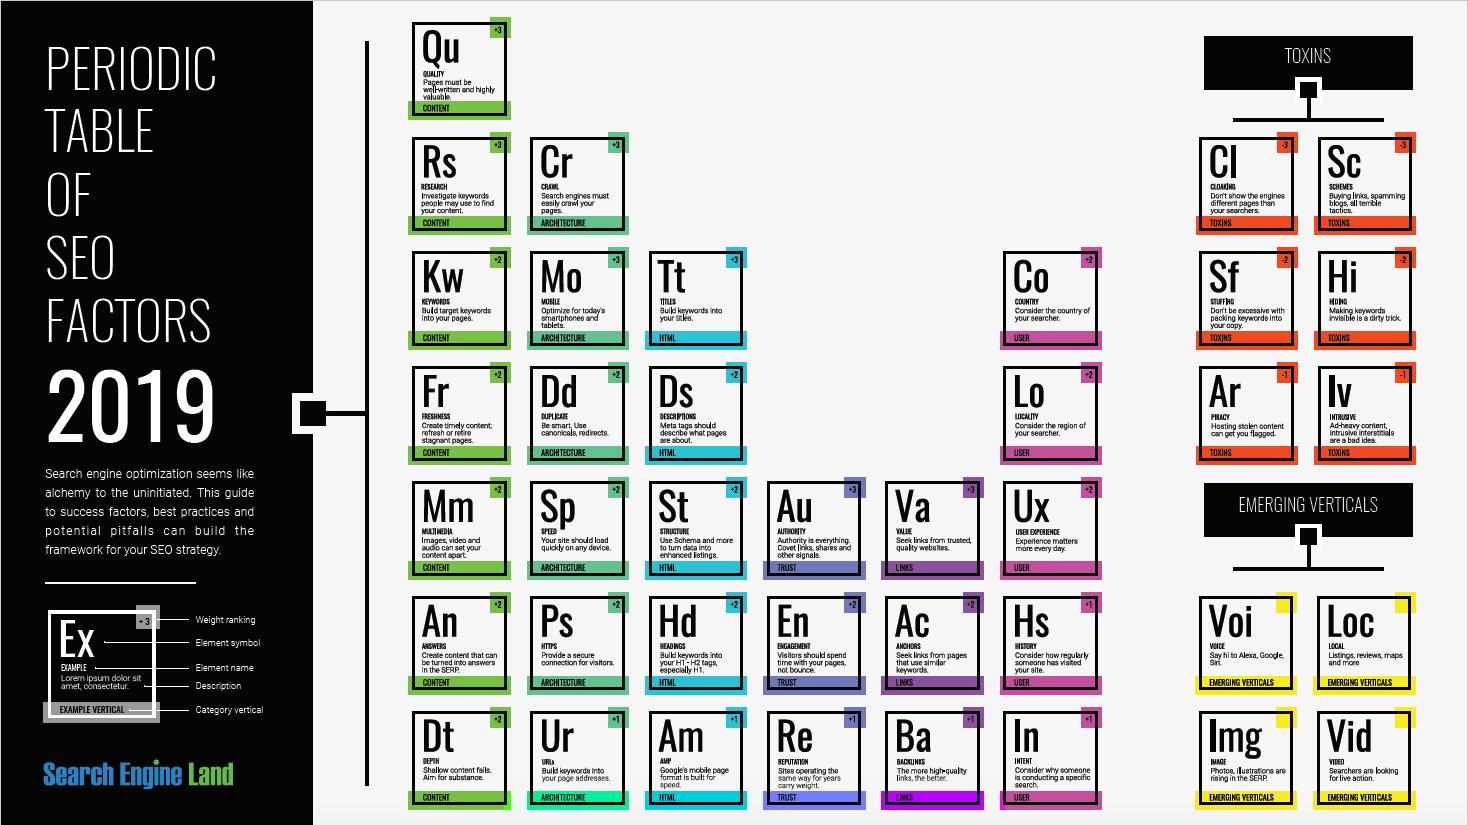 2019 Periodic Table of SEO